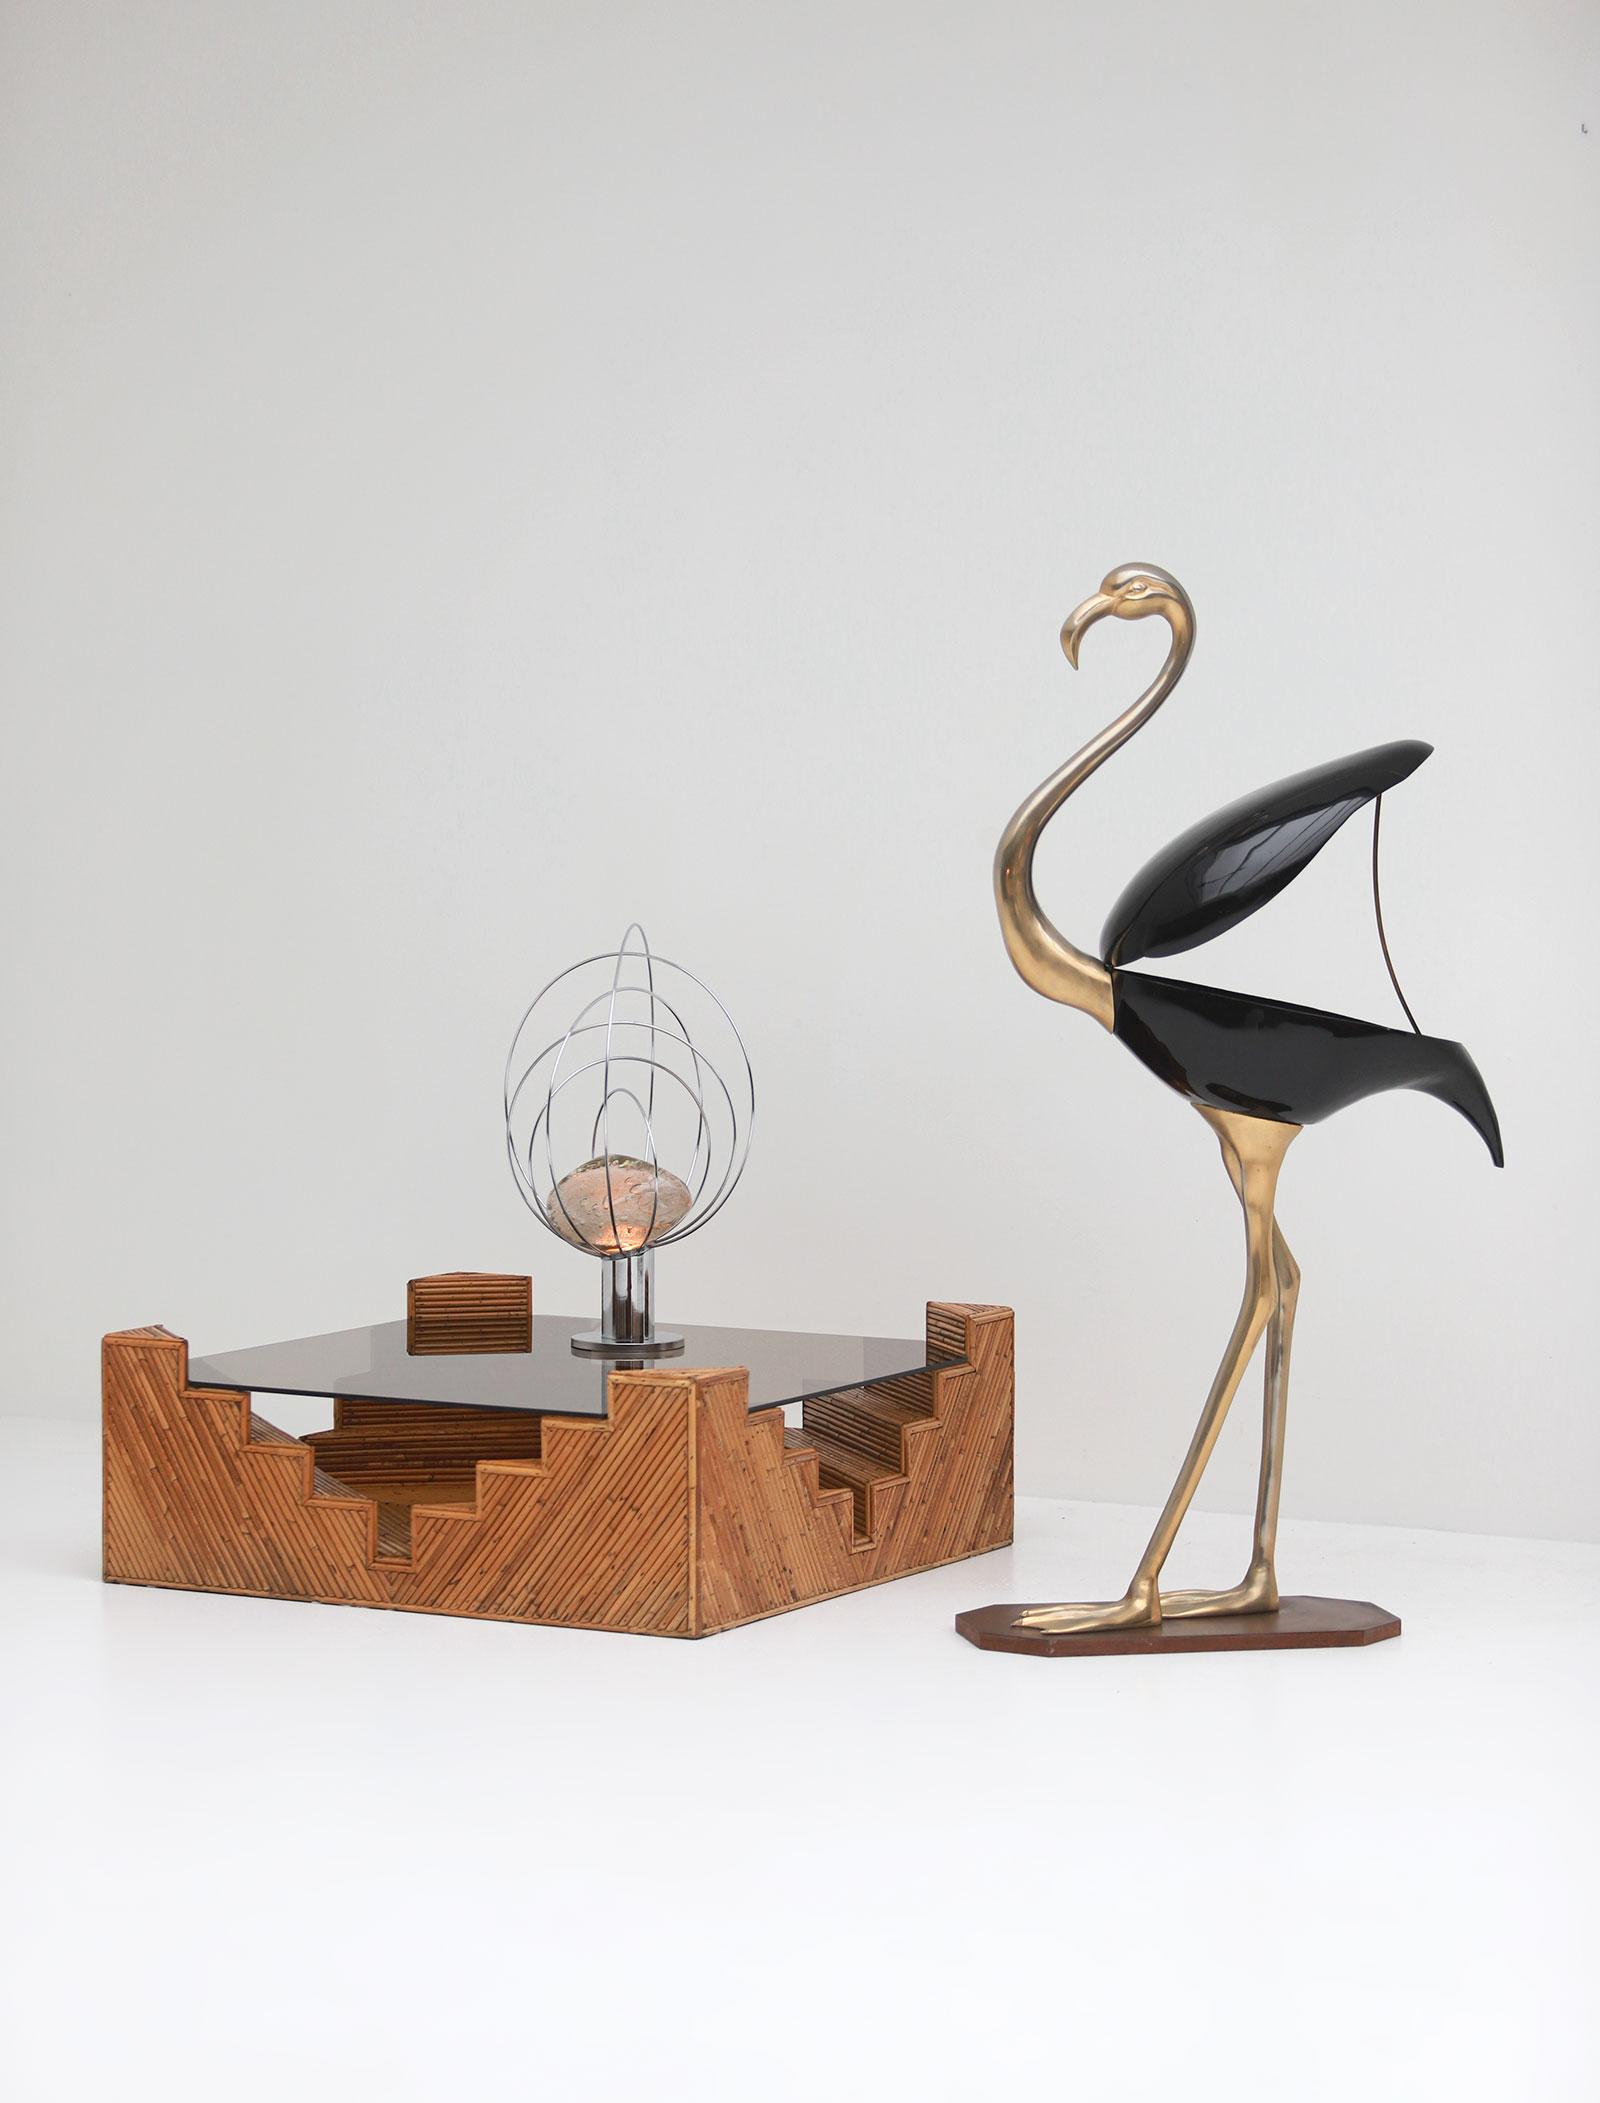 Fondica Lifesize Brass Flamingo 1970simage 3